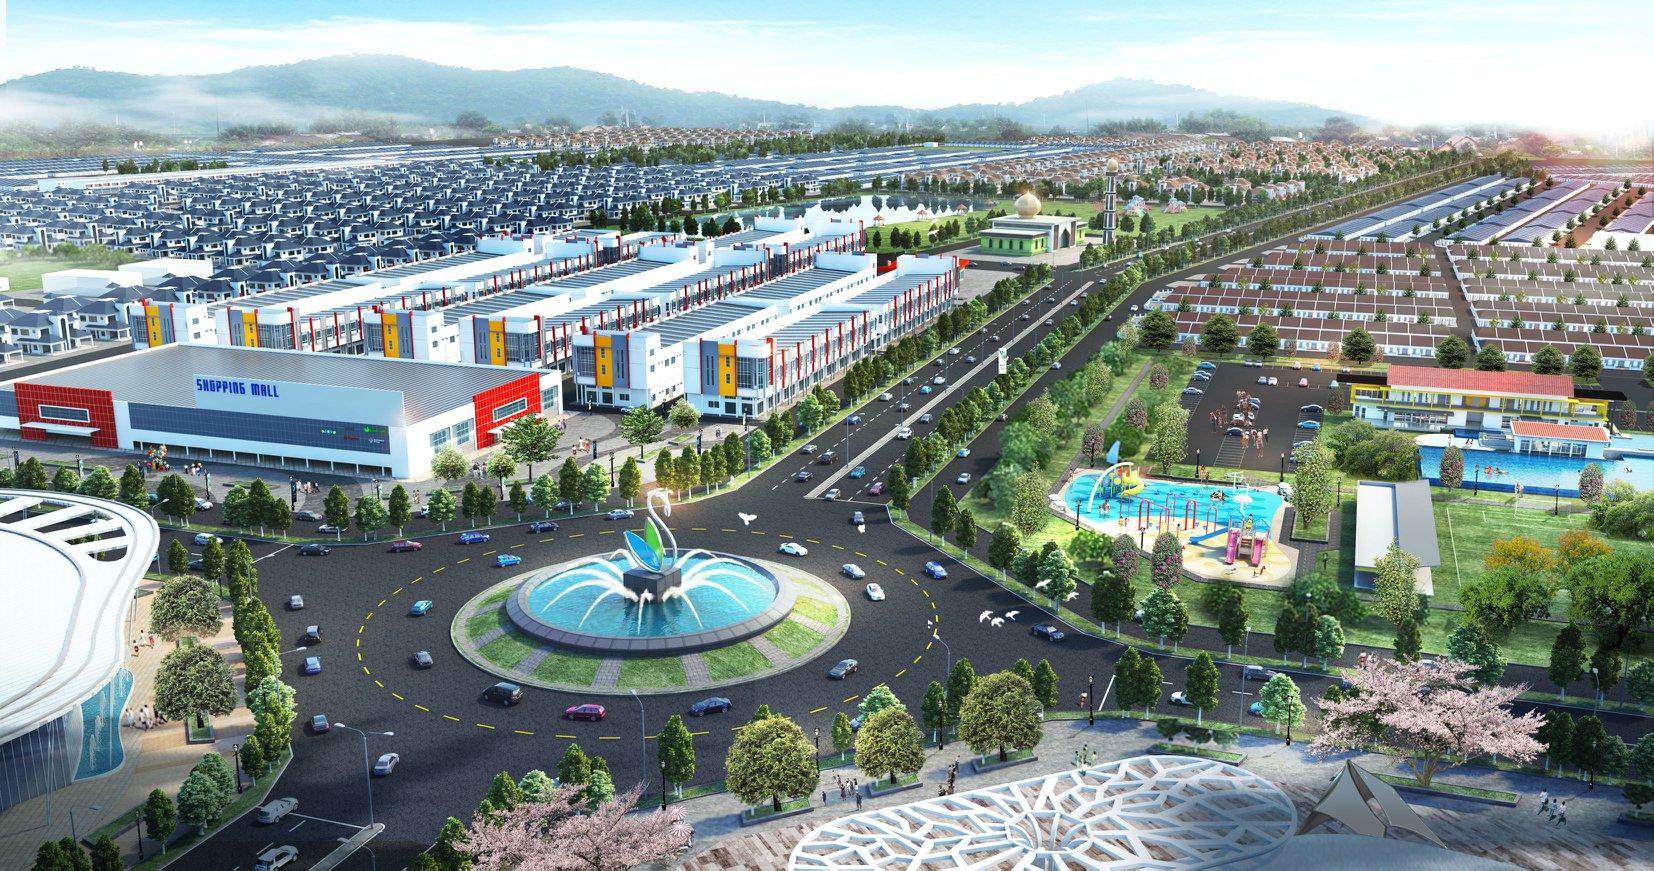 Bandar Baru Setia Awan Perdana Aerial View